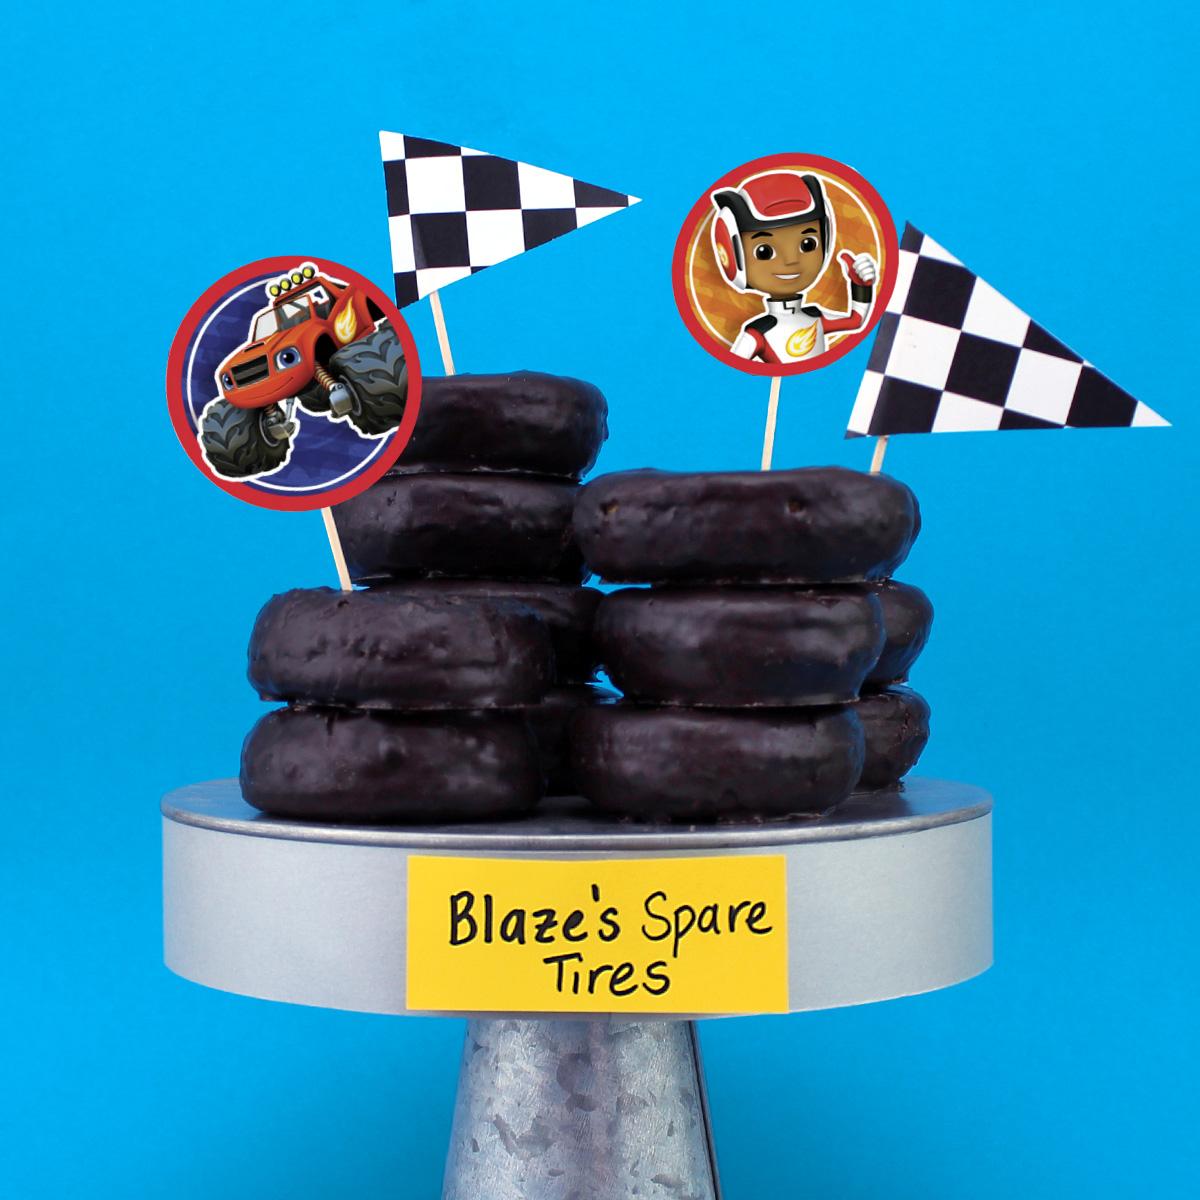 Blaze's Spare Tire Donuts